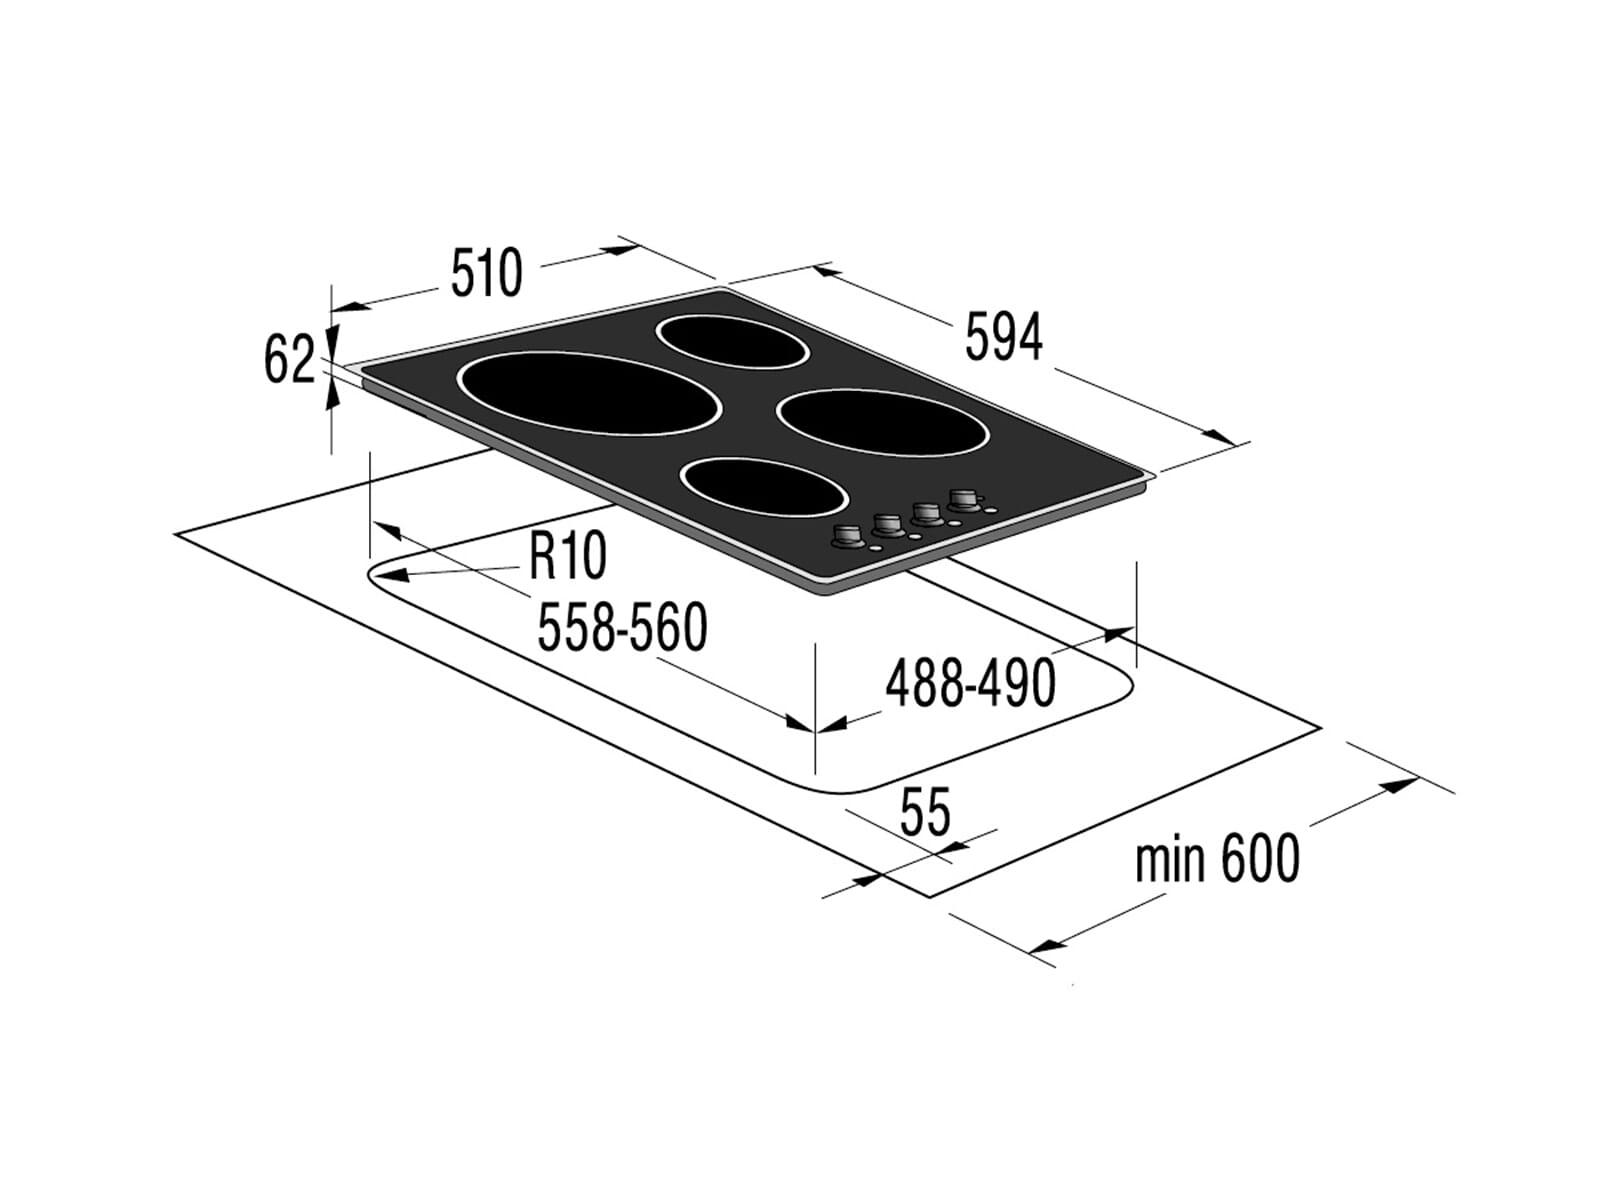 gorenje classico eck 63 clb glaskeramikkochfeld autark ebay. Black Bedroom Furniture Sets. Home Design Ideas